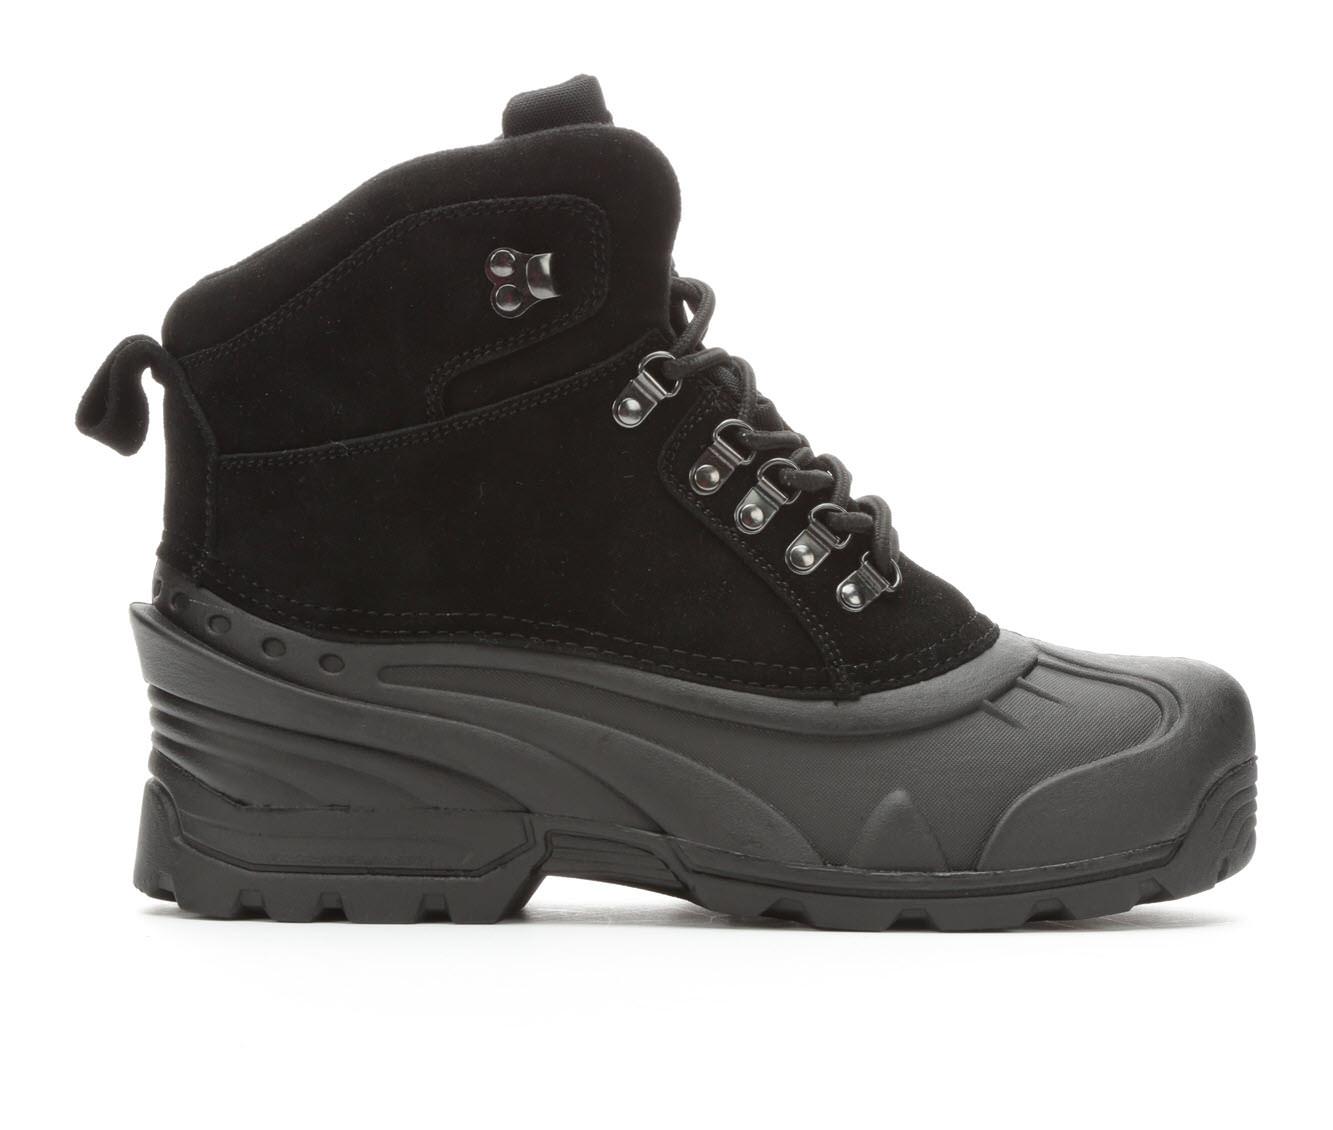 Itasca Sonoma Ice House II Men's Boots (Black)